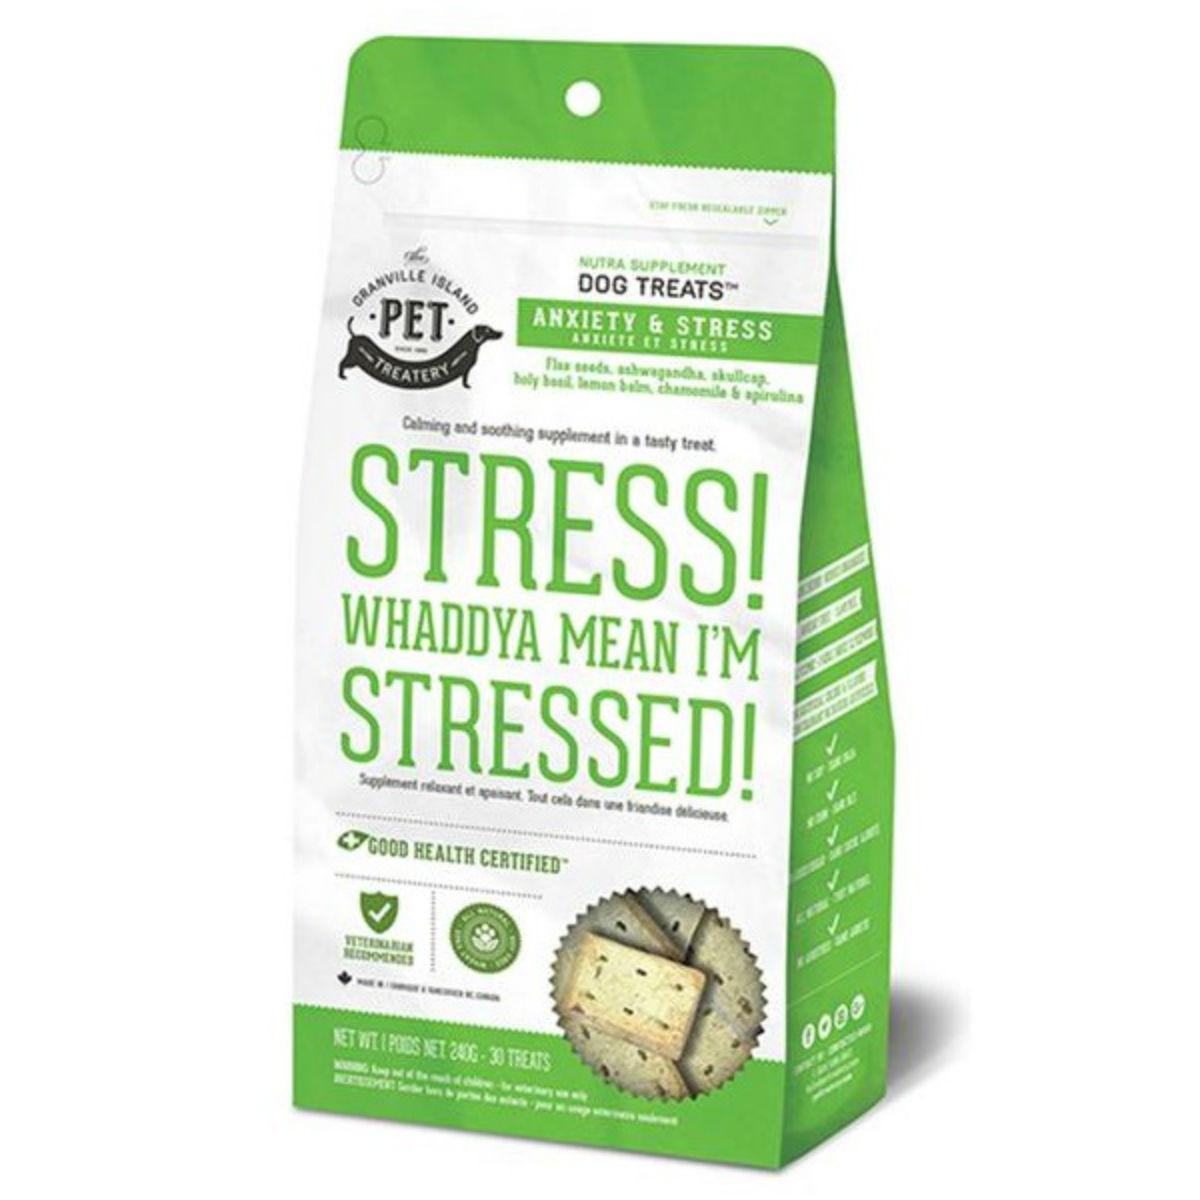 Granville Nutra Dog Treats - Anxiety & Stress